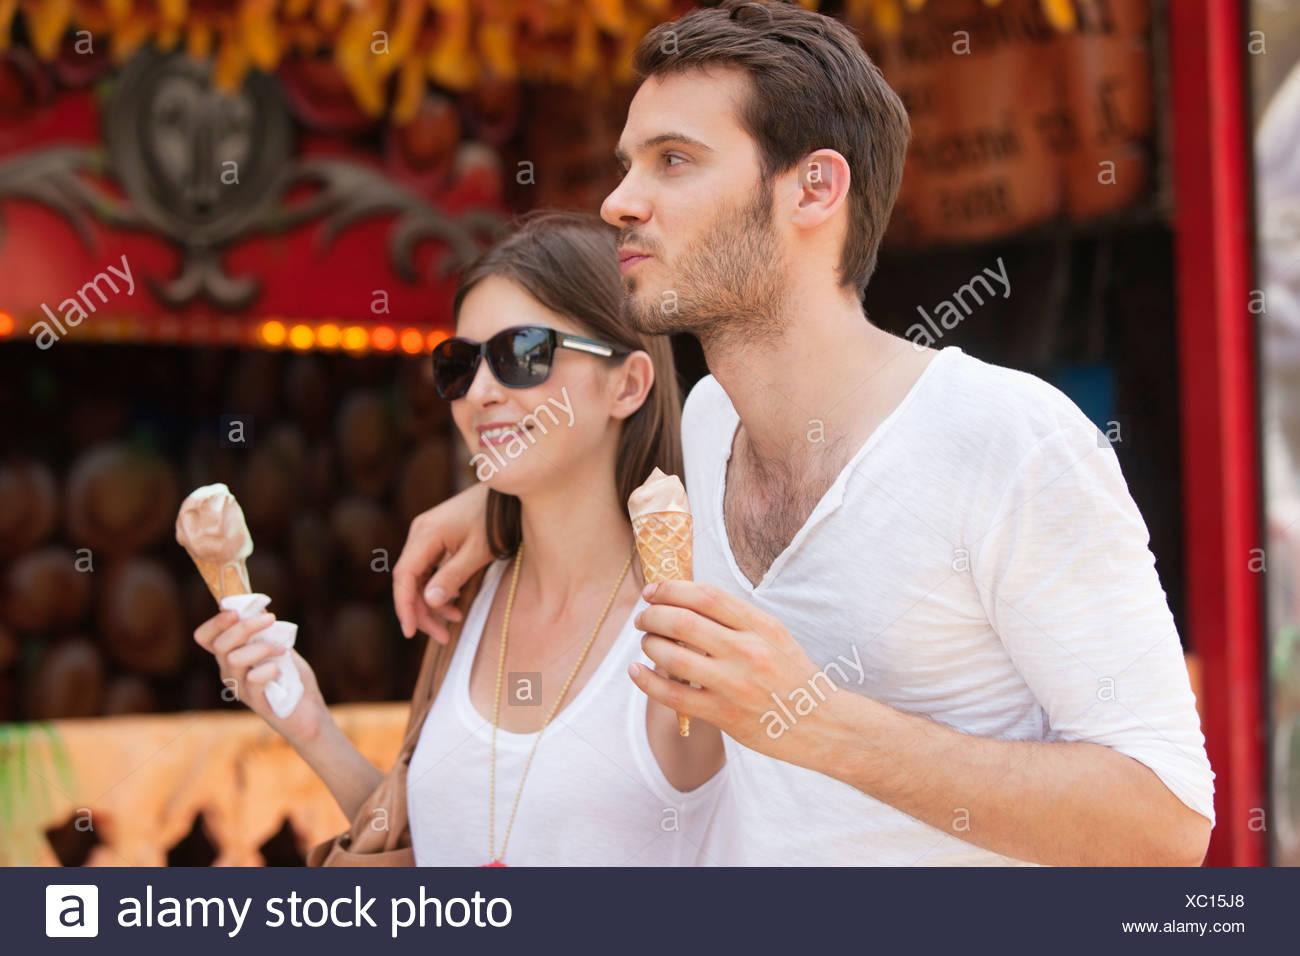 Couple eating ice creams, Paris, Ile-de-France, France - Stock Image